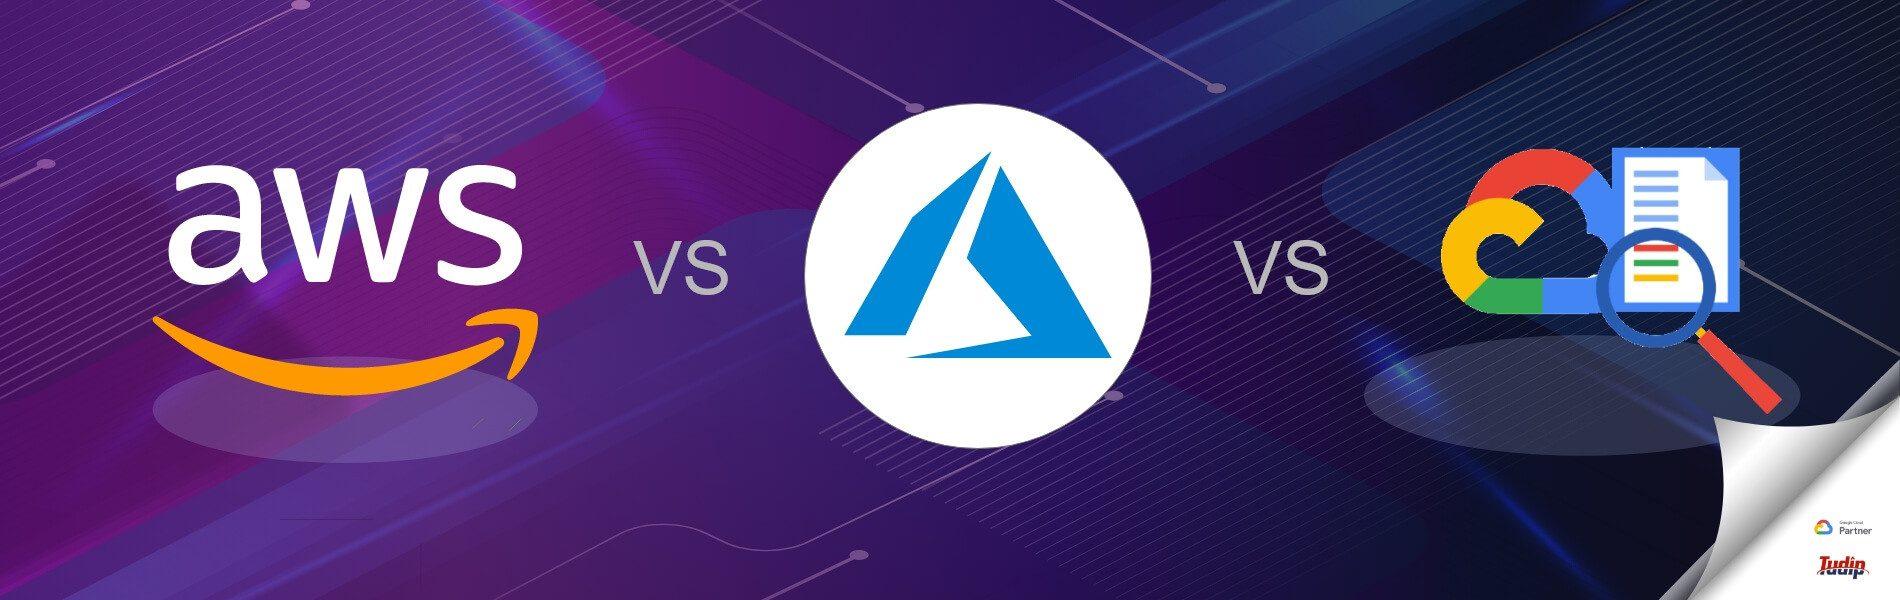 AWS Vs Azure Vs GCP – Cloud Services